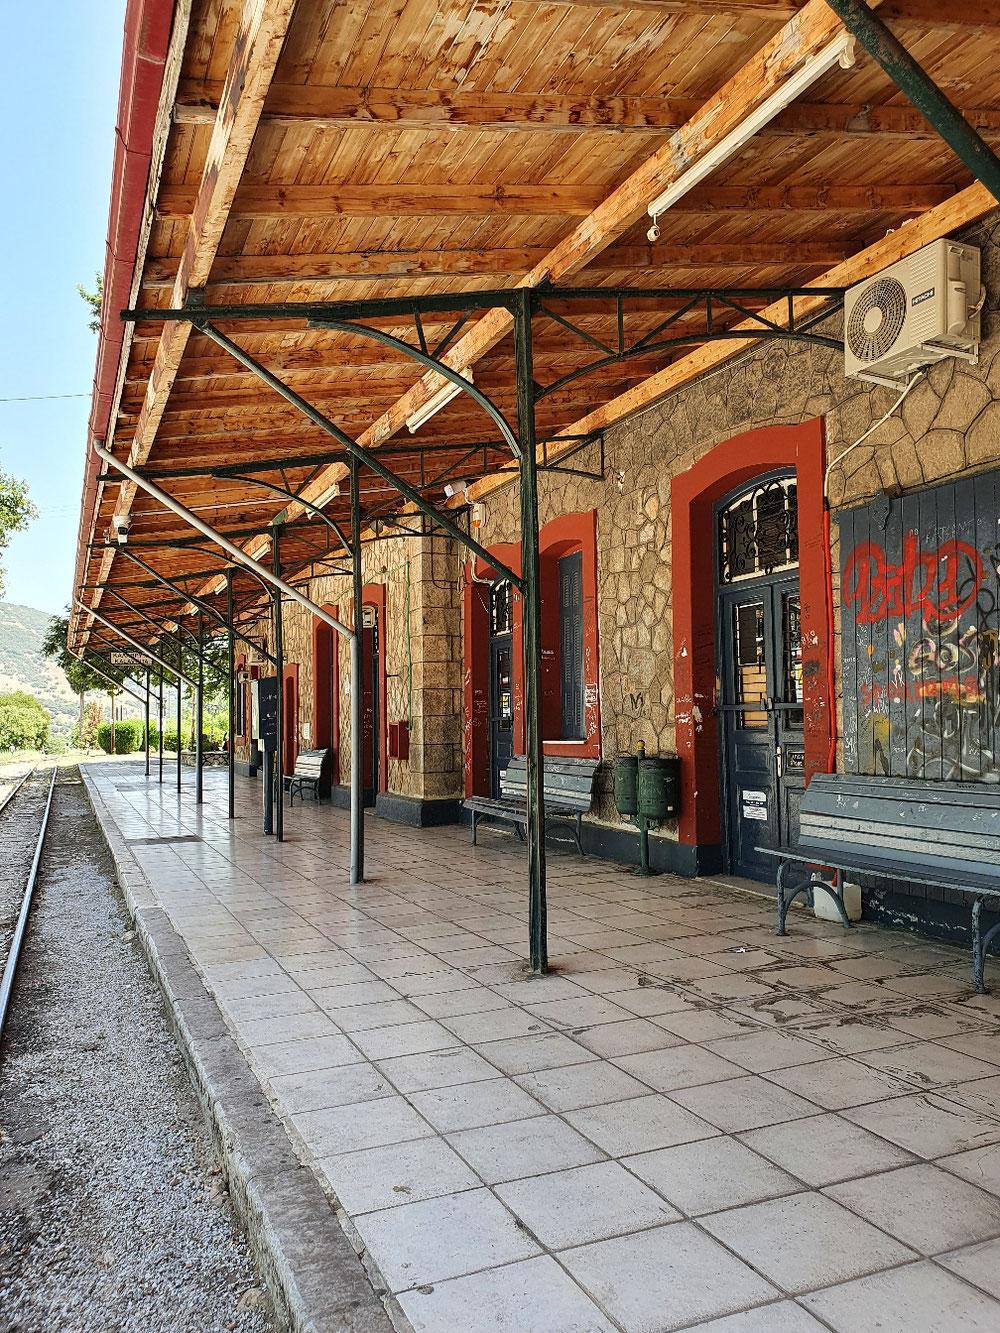 Bahnhof von Kalavryta